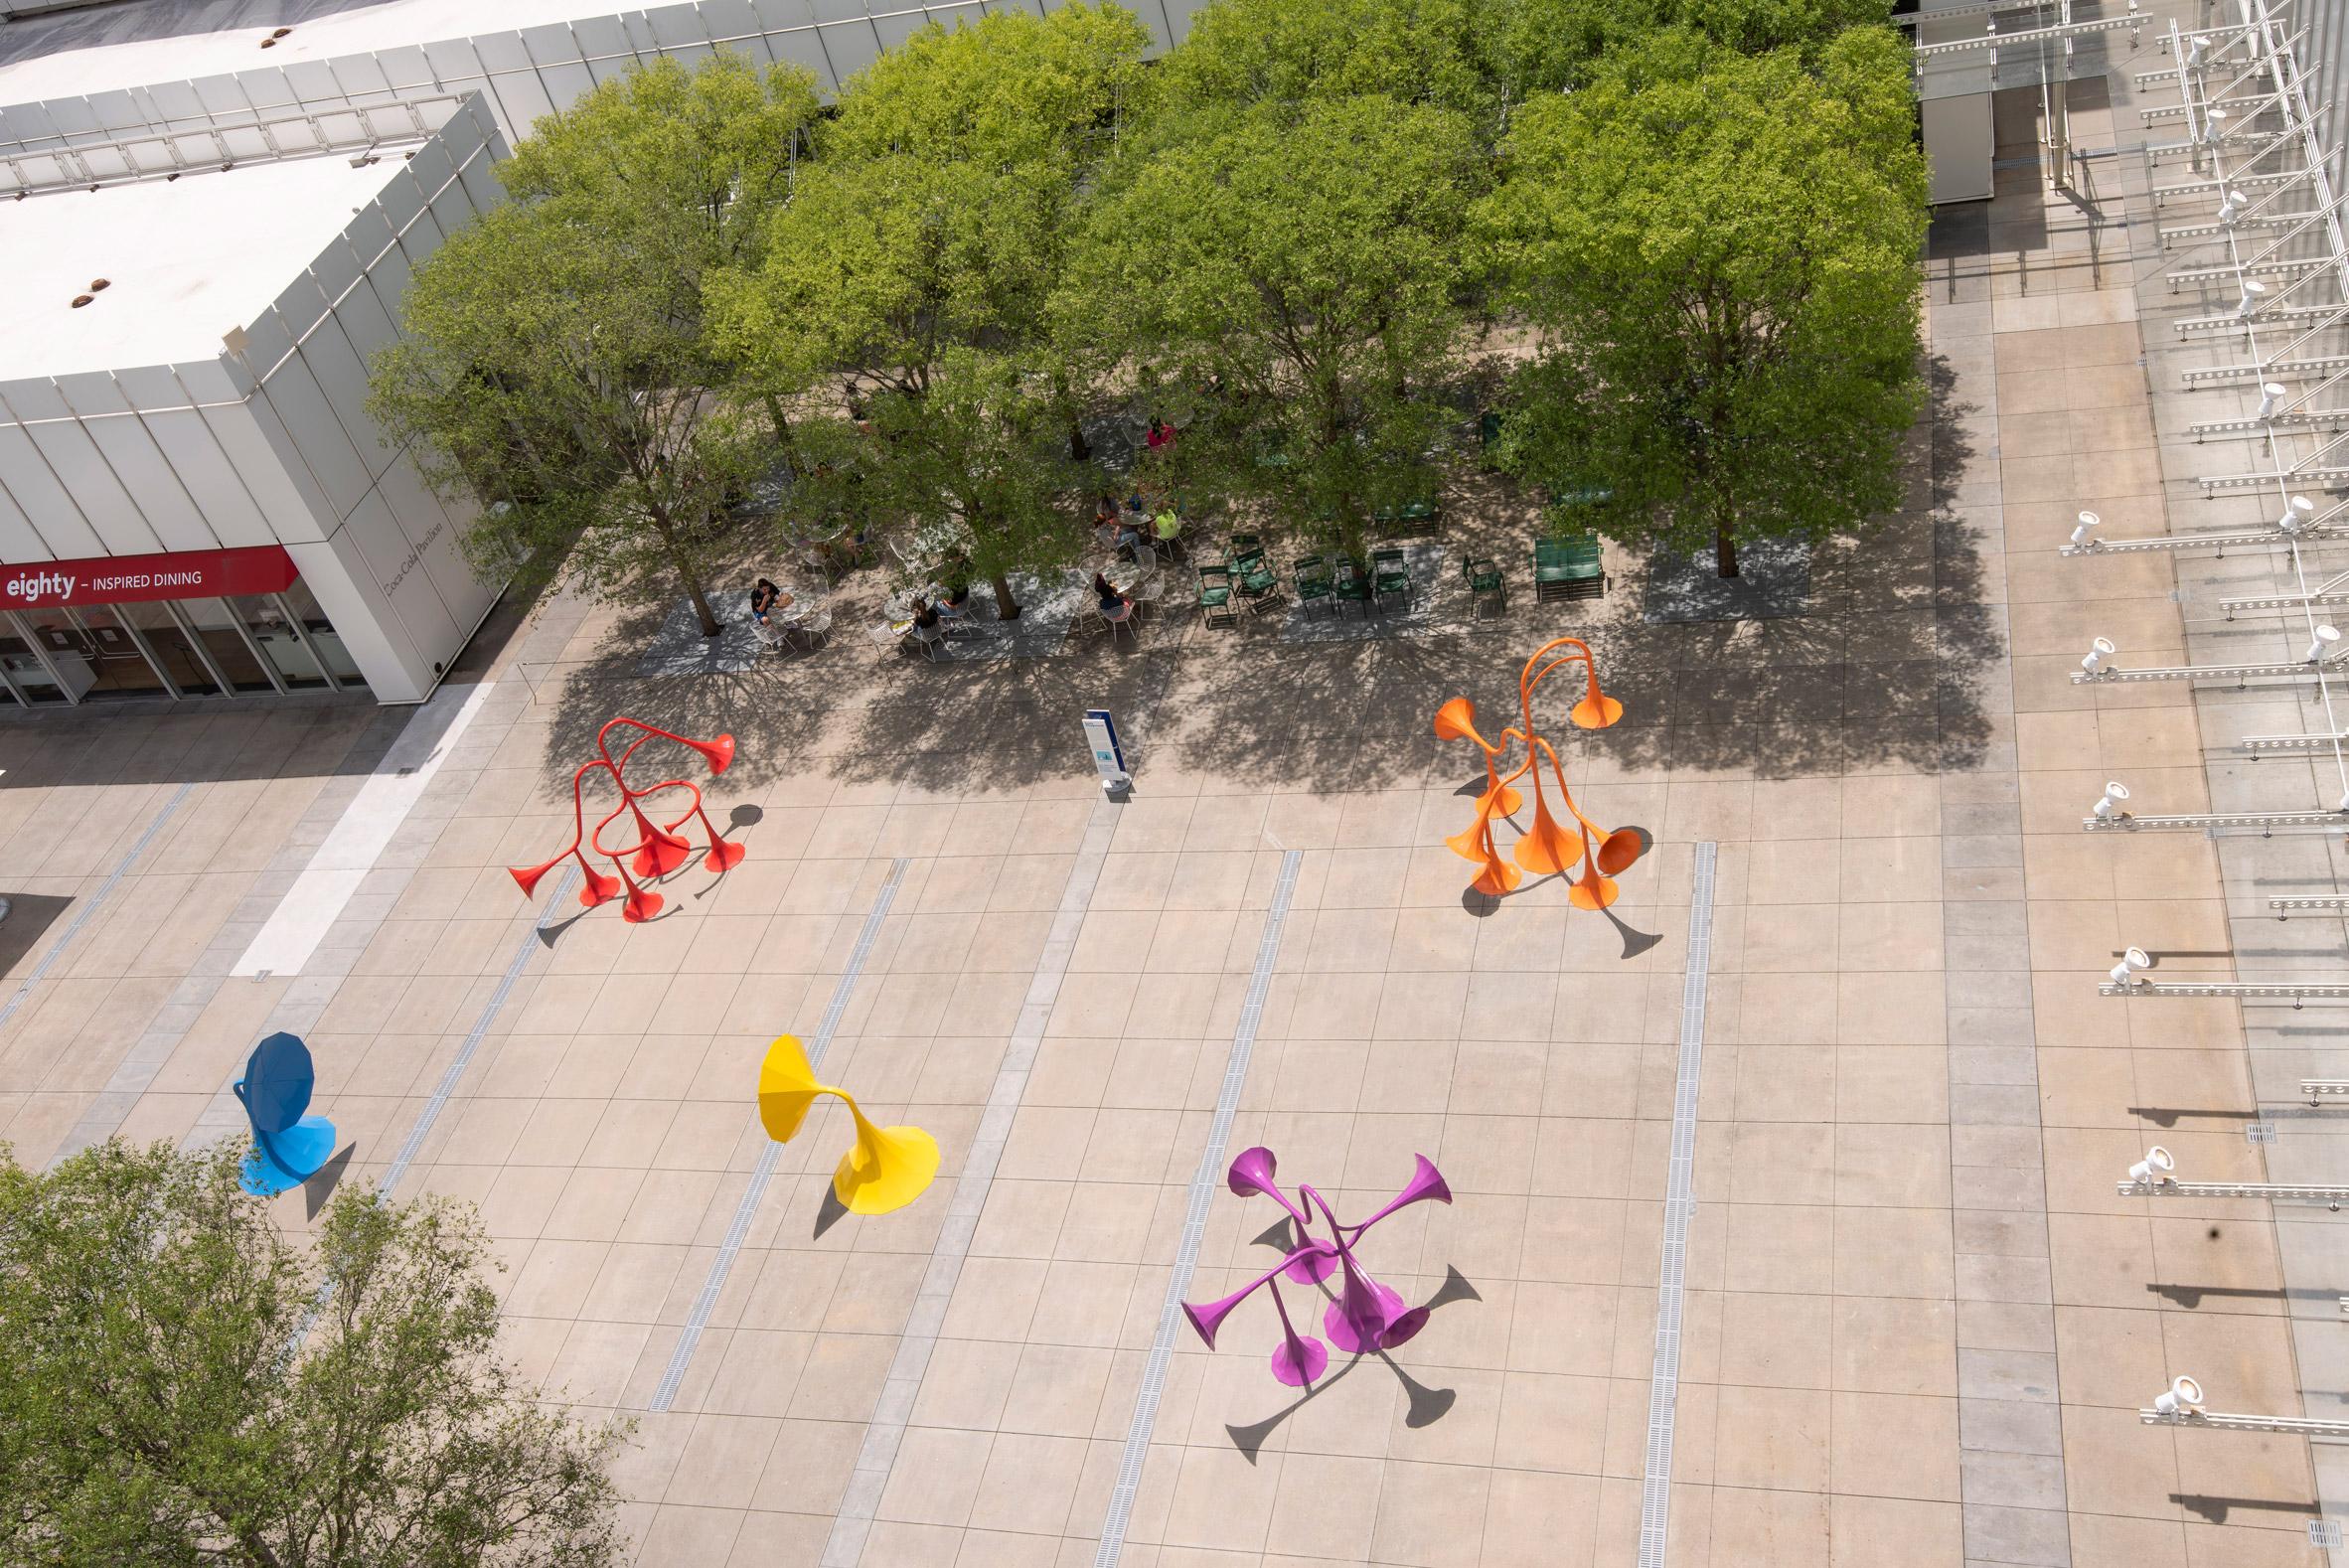 Yuri Suzuki installs six colourful sound-modifying sculptures in Atlanta